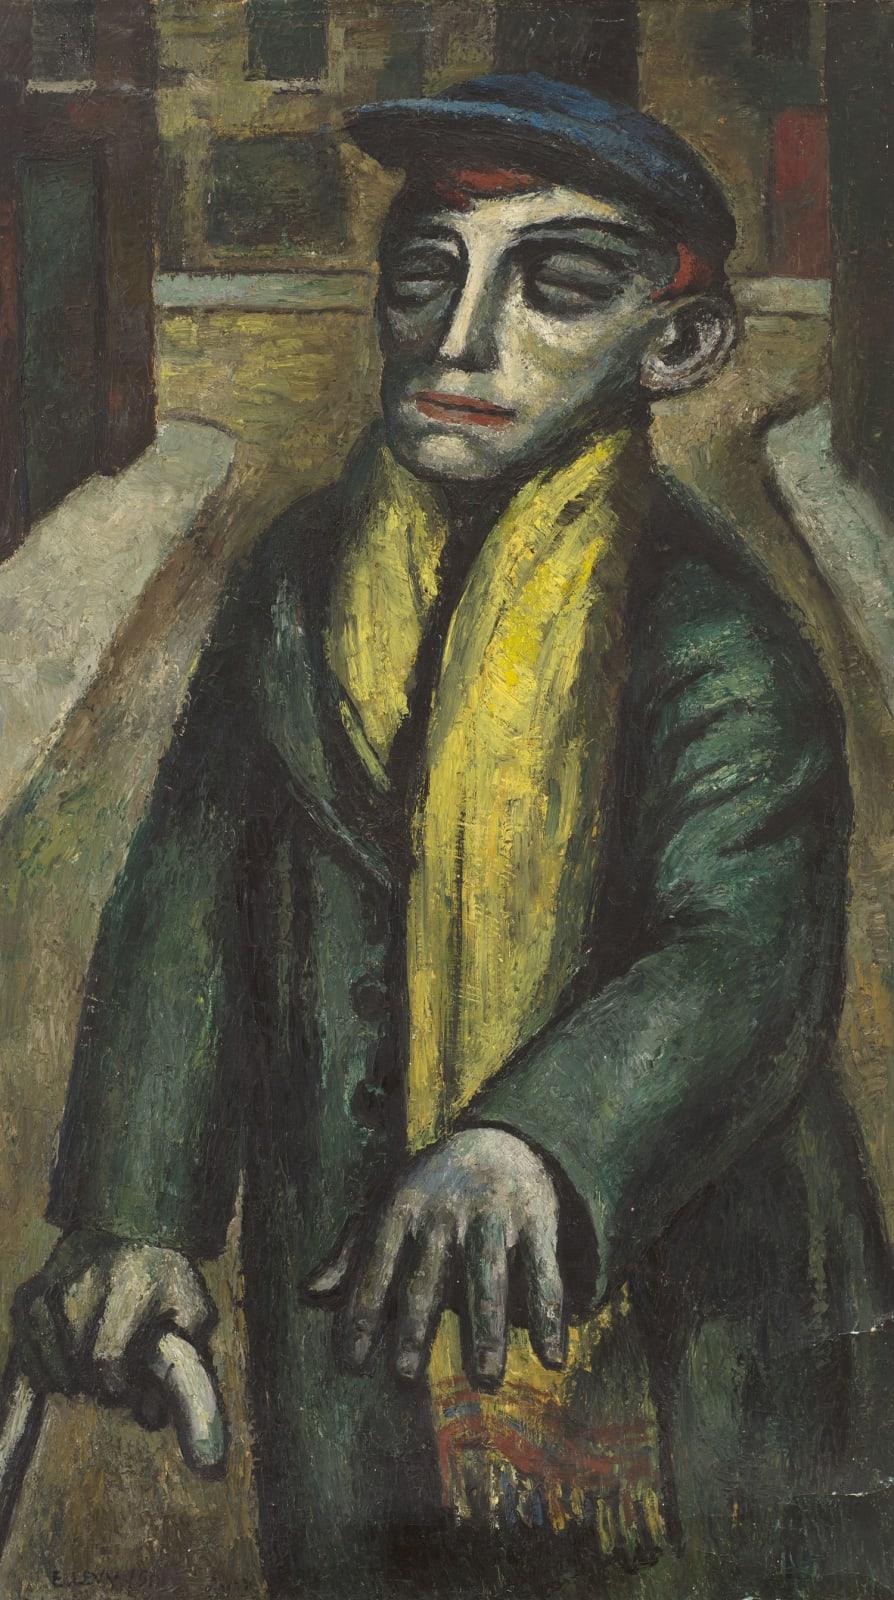 Emmanuel Levy (1900-1986) The Blind Man of Hightown 1946 Oil on canvas 106 x 59.5 cm Ben Uri Collection © Emmanuel Levy estate